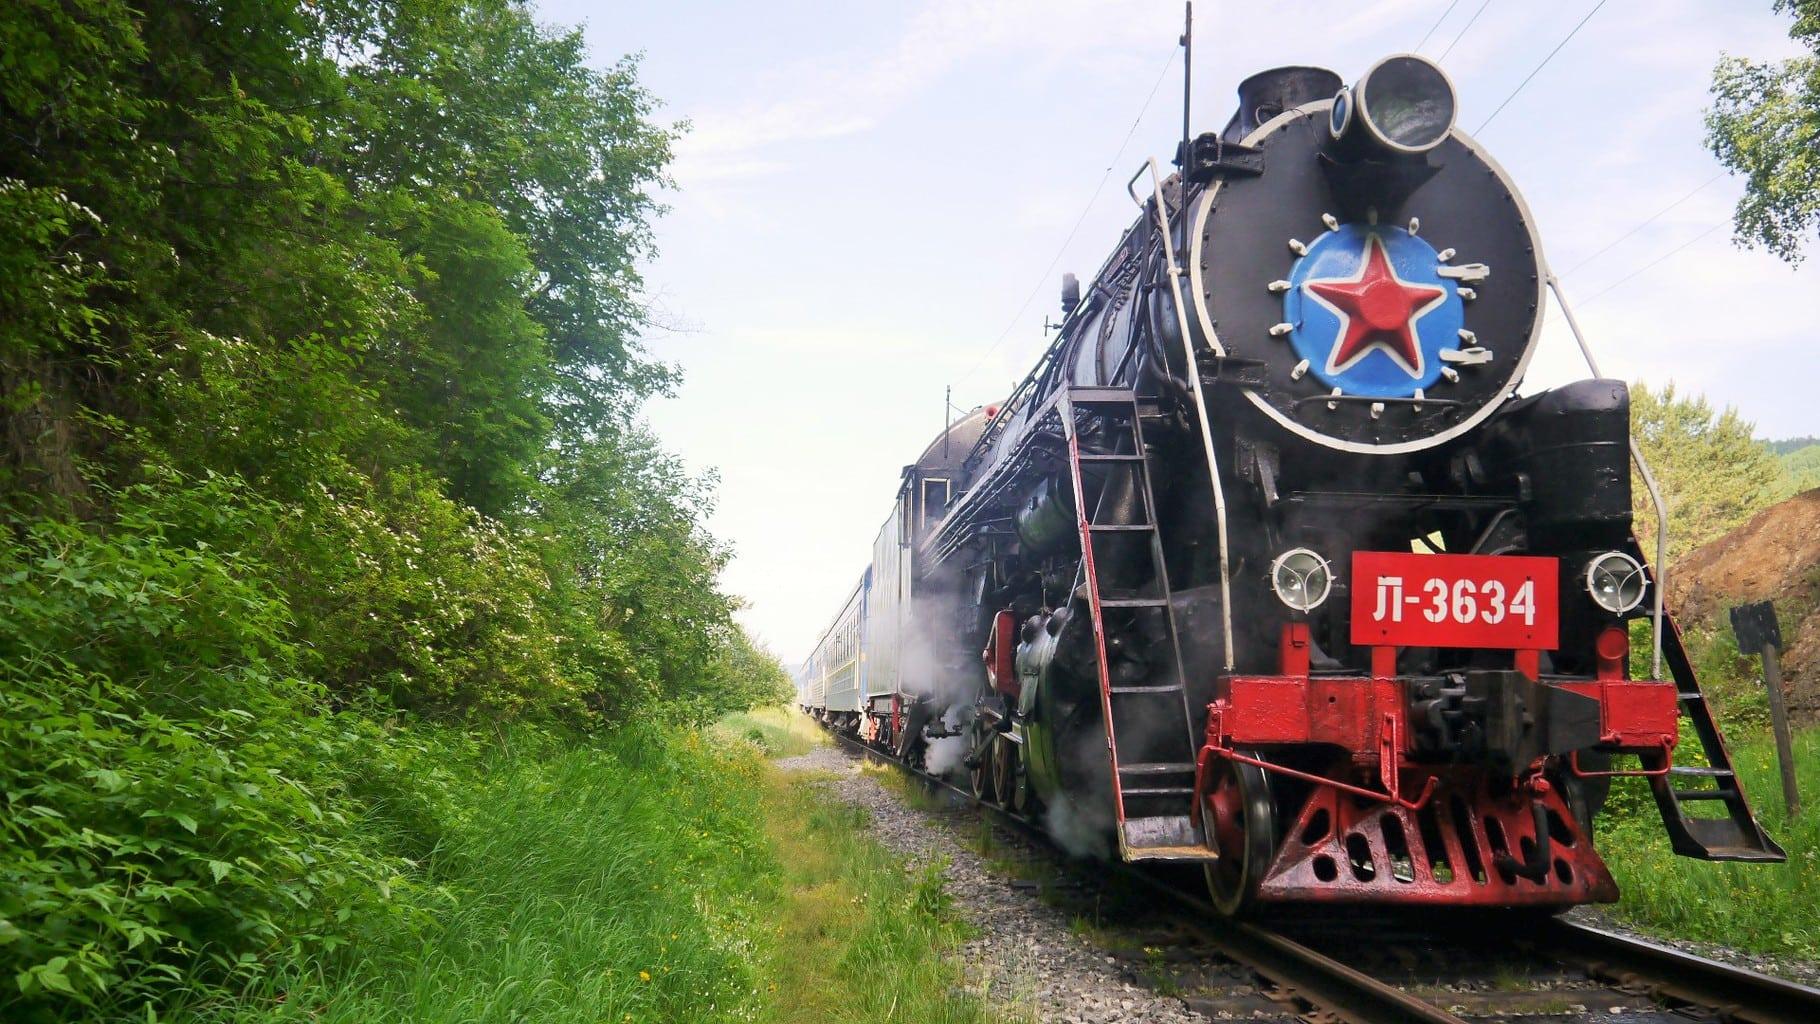 The Trans Siberian train